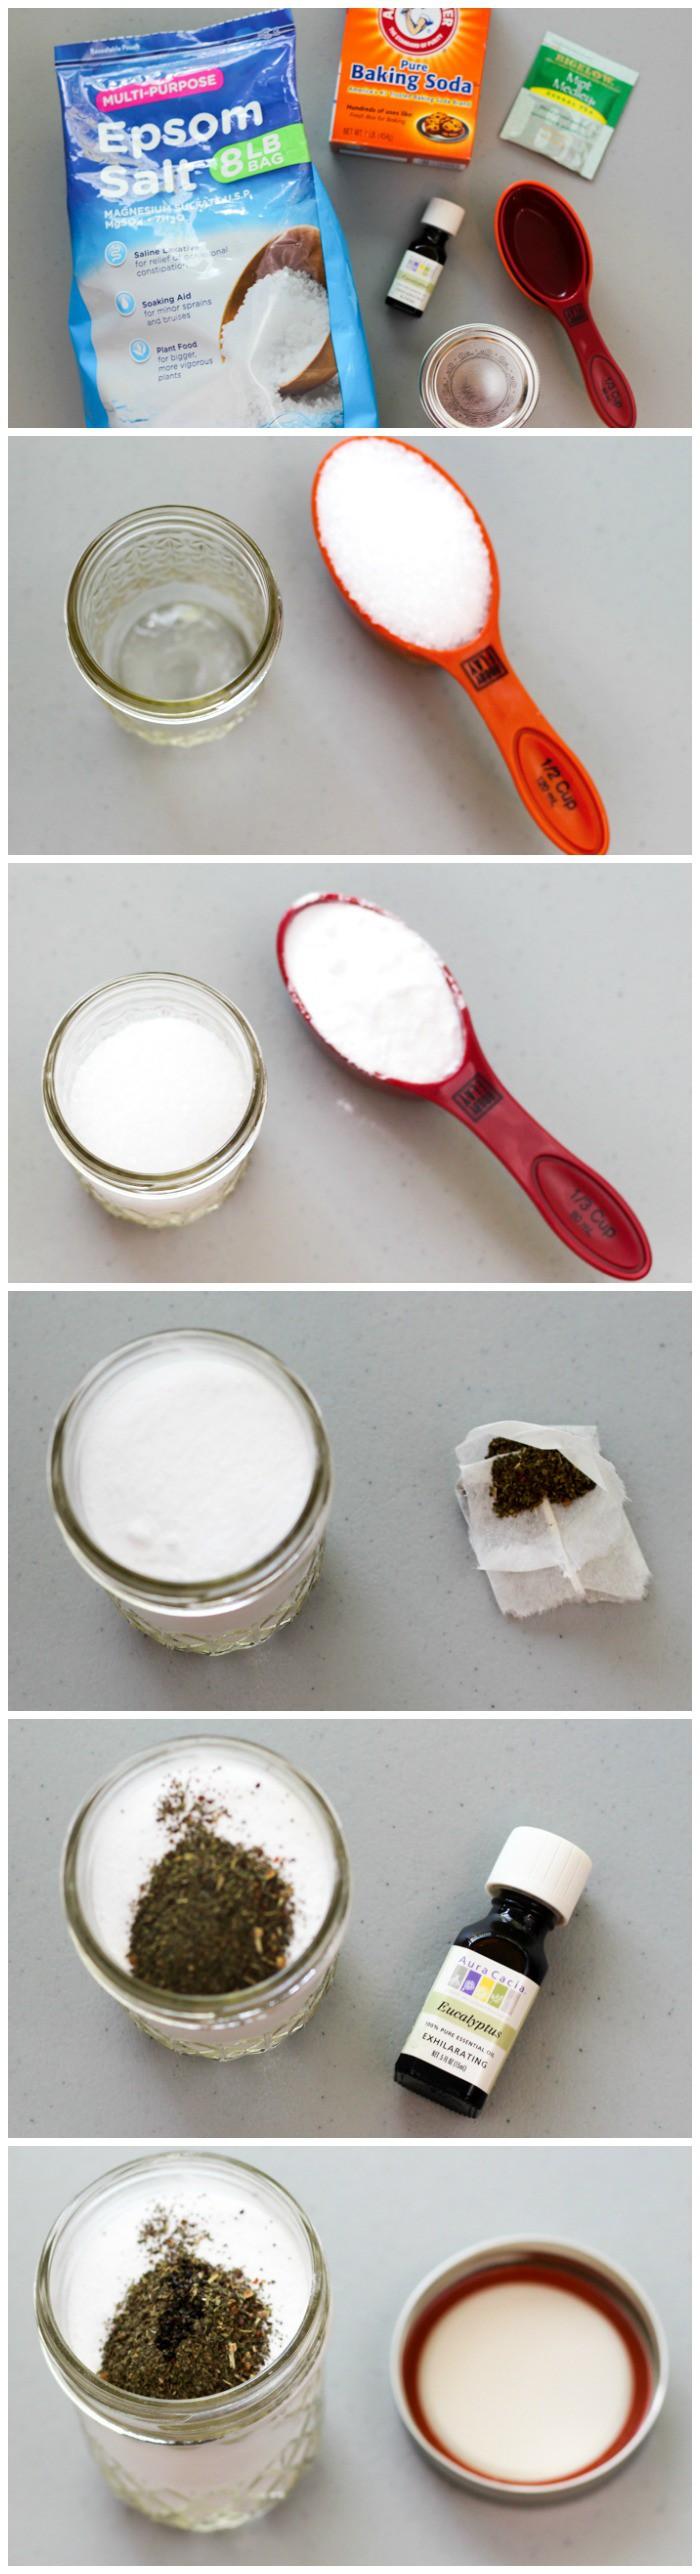 How to make a DIY foot soak - full tutorial on ingredients plus a free printable